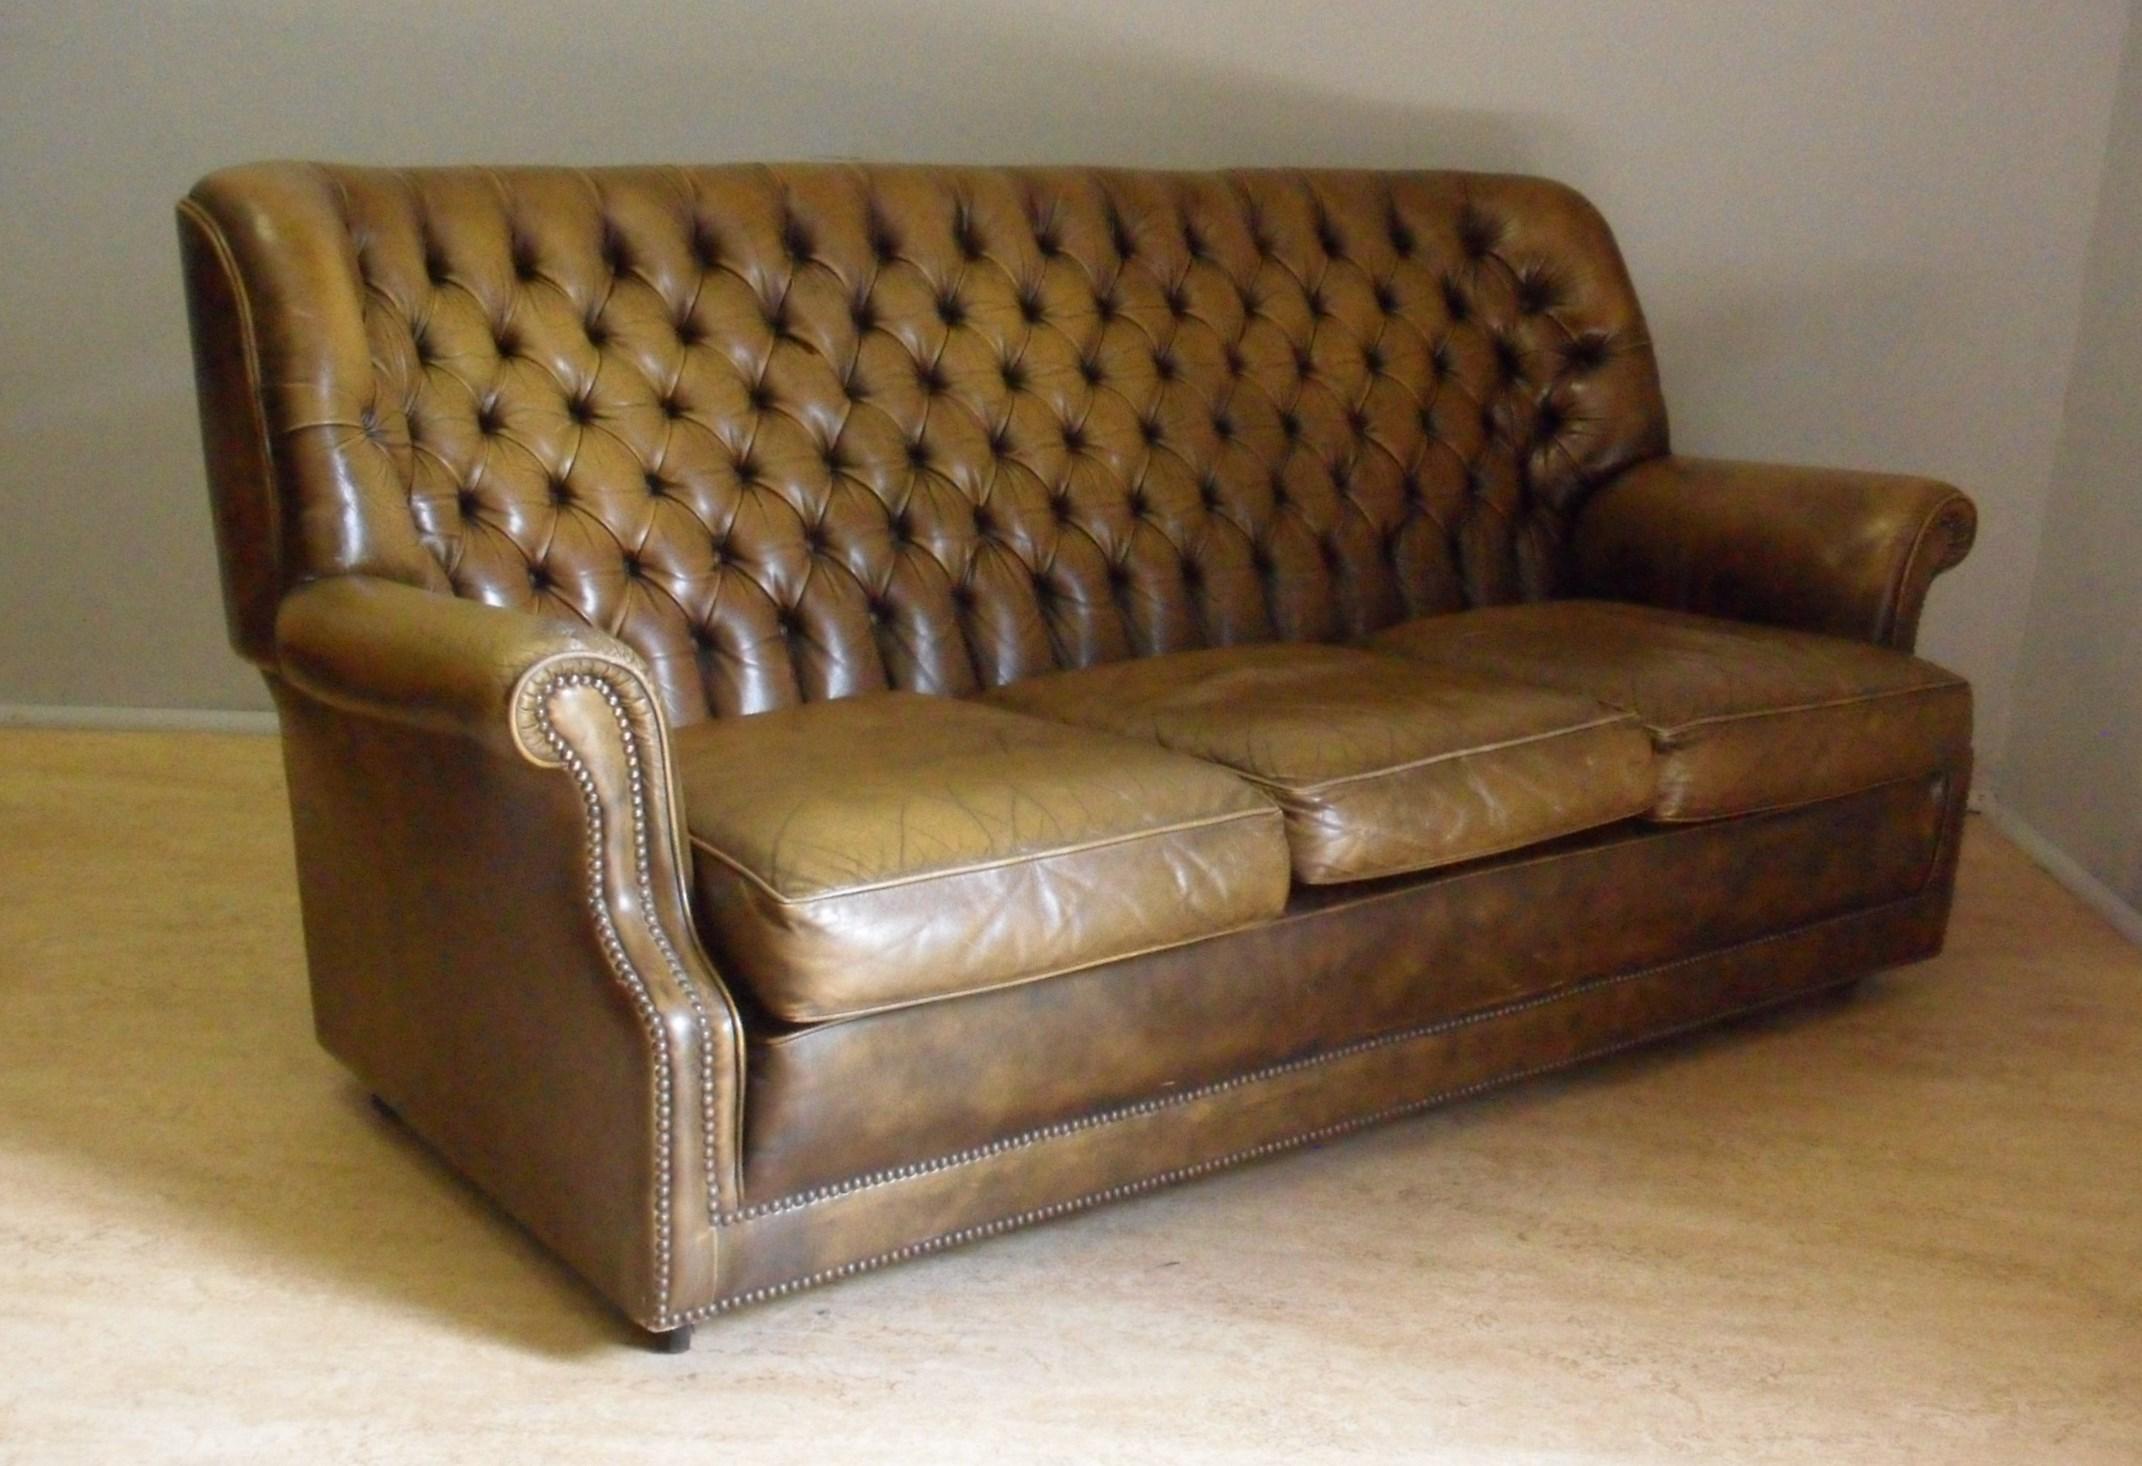 leather chesterfield sofa beige 2 seater bed dimensions pegasus tan mygreendaddy